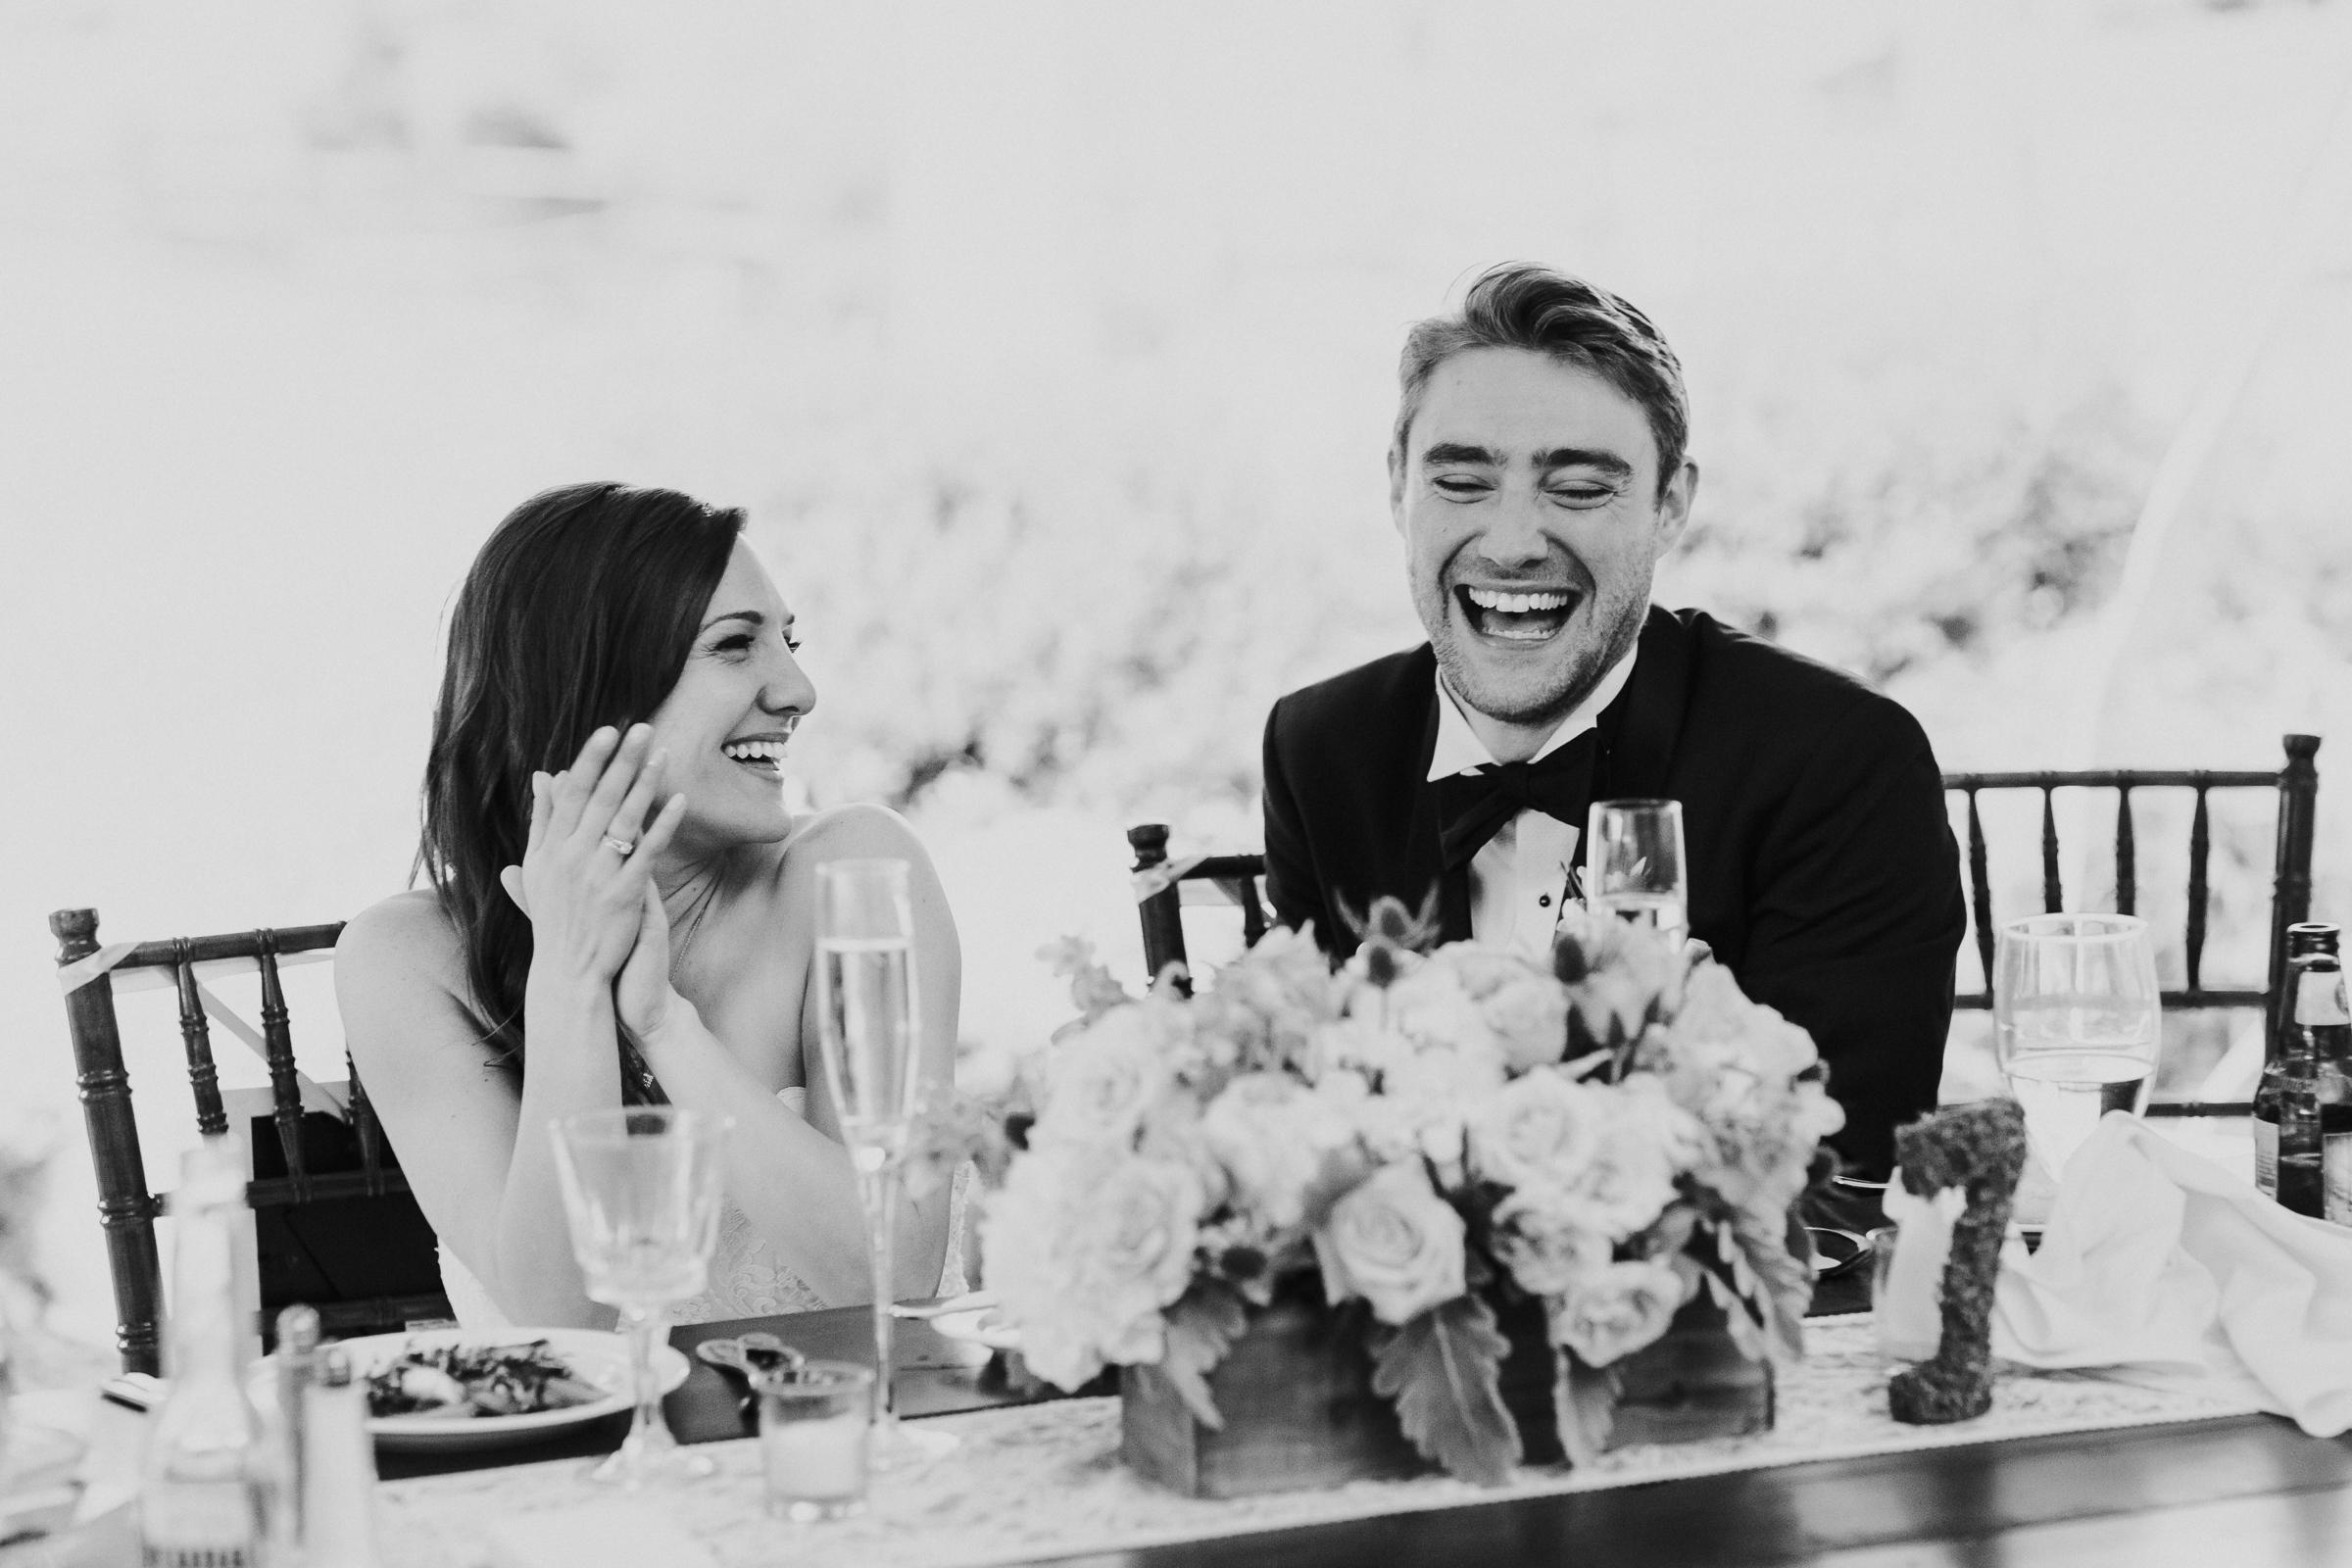 New-York-Documentary-Wedding-Photography-Best-Of-2017-by-Elvira-Kalviste-Photography-12.jpg